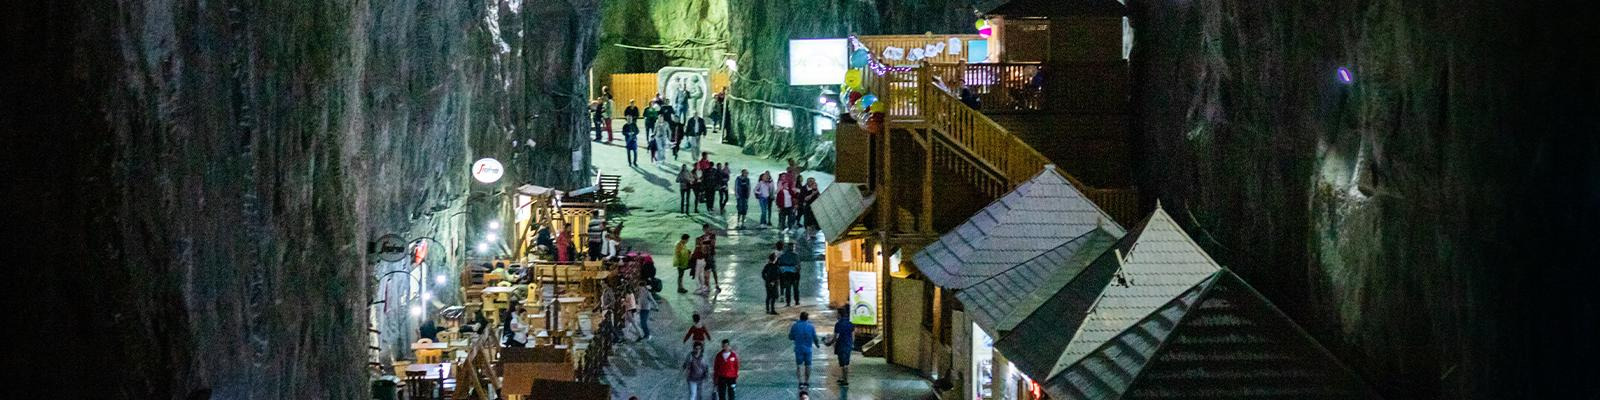 The Salina Turda mines of Romania